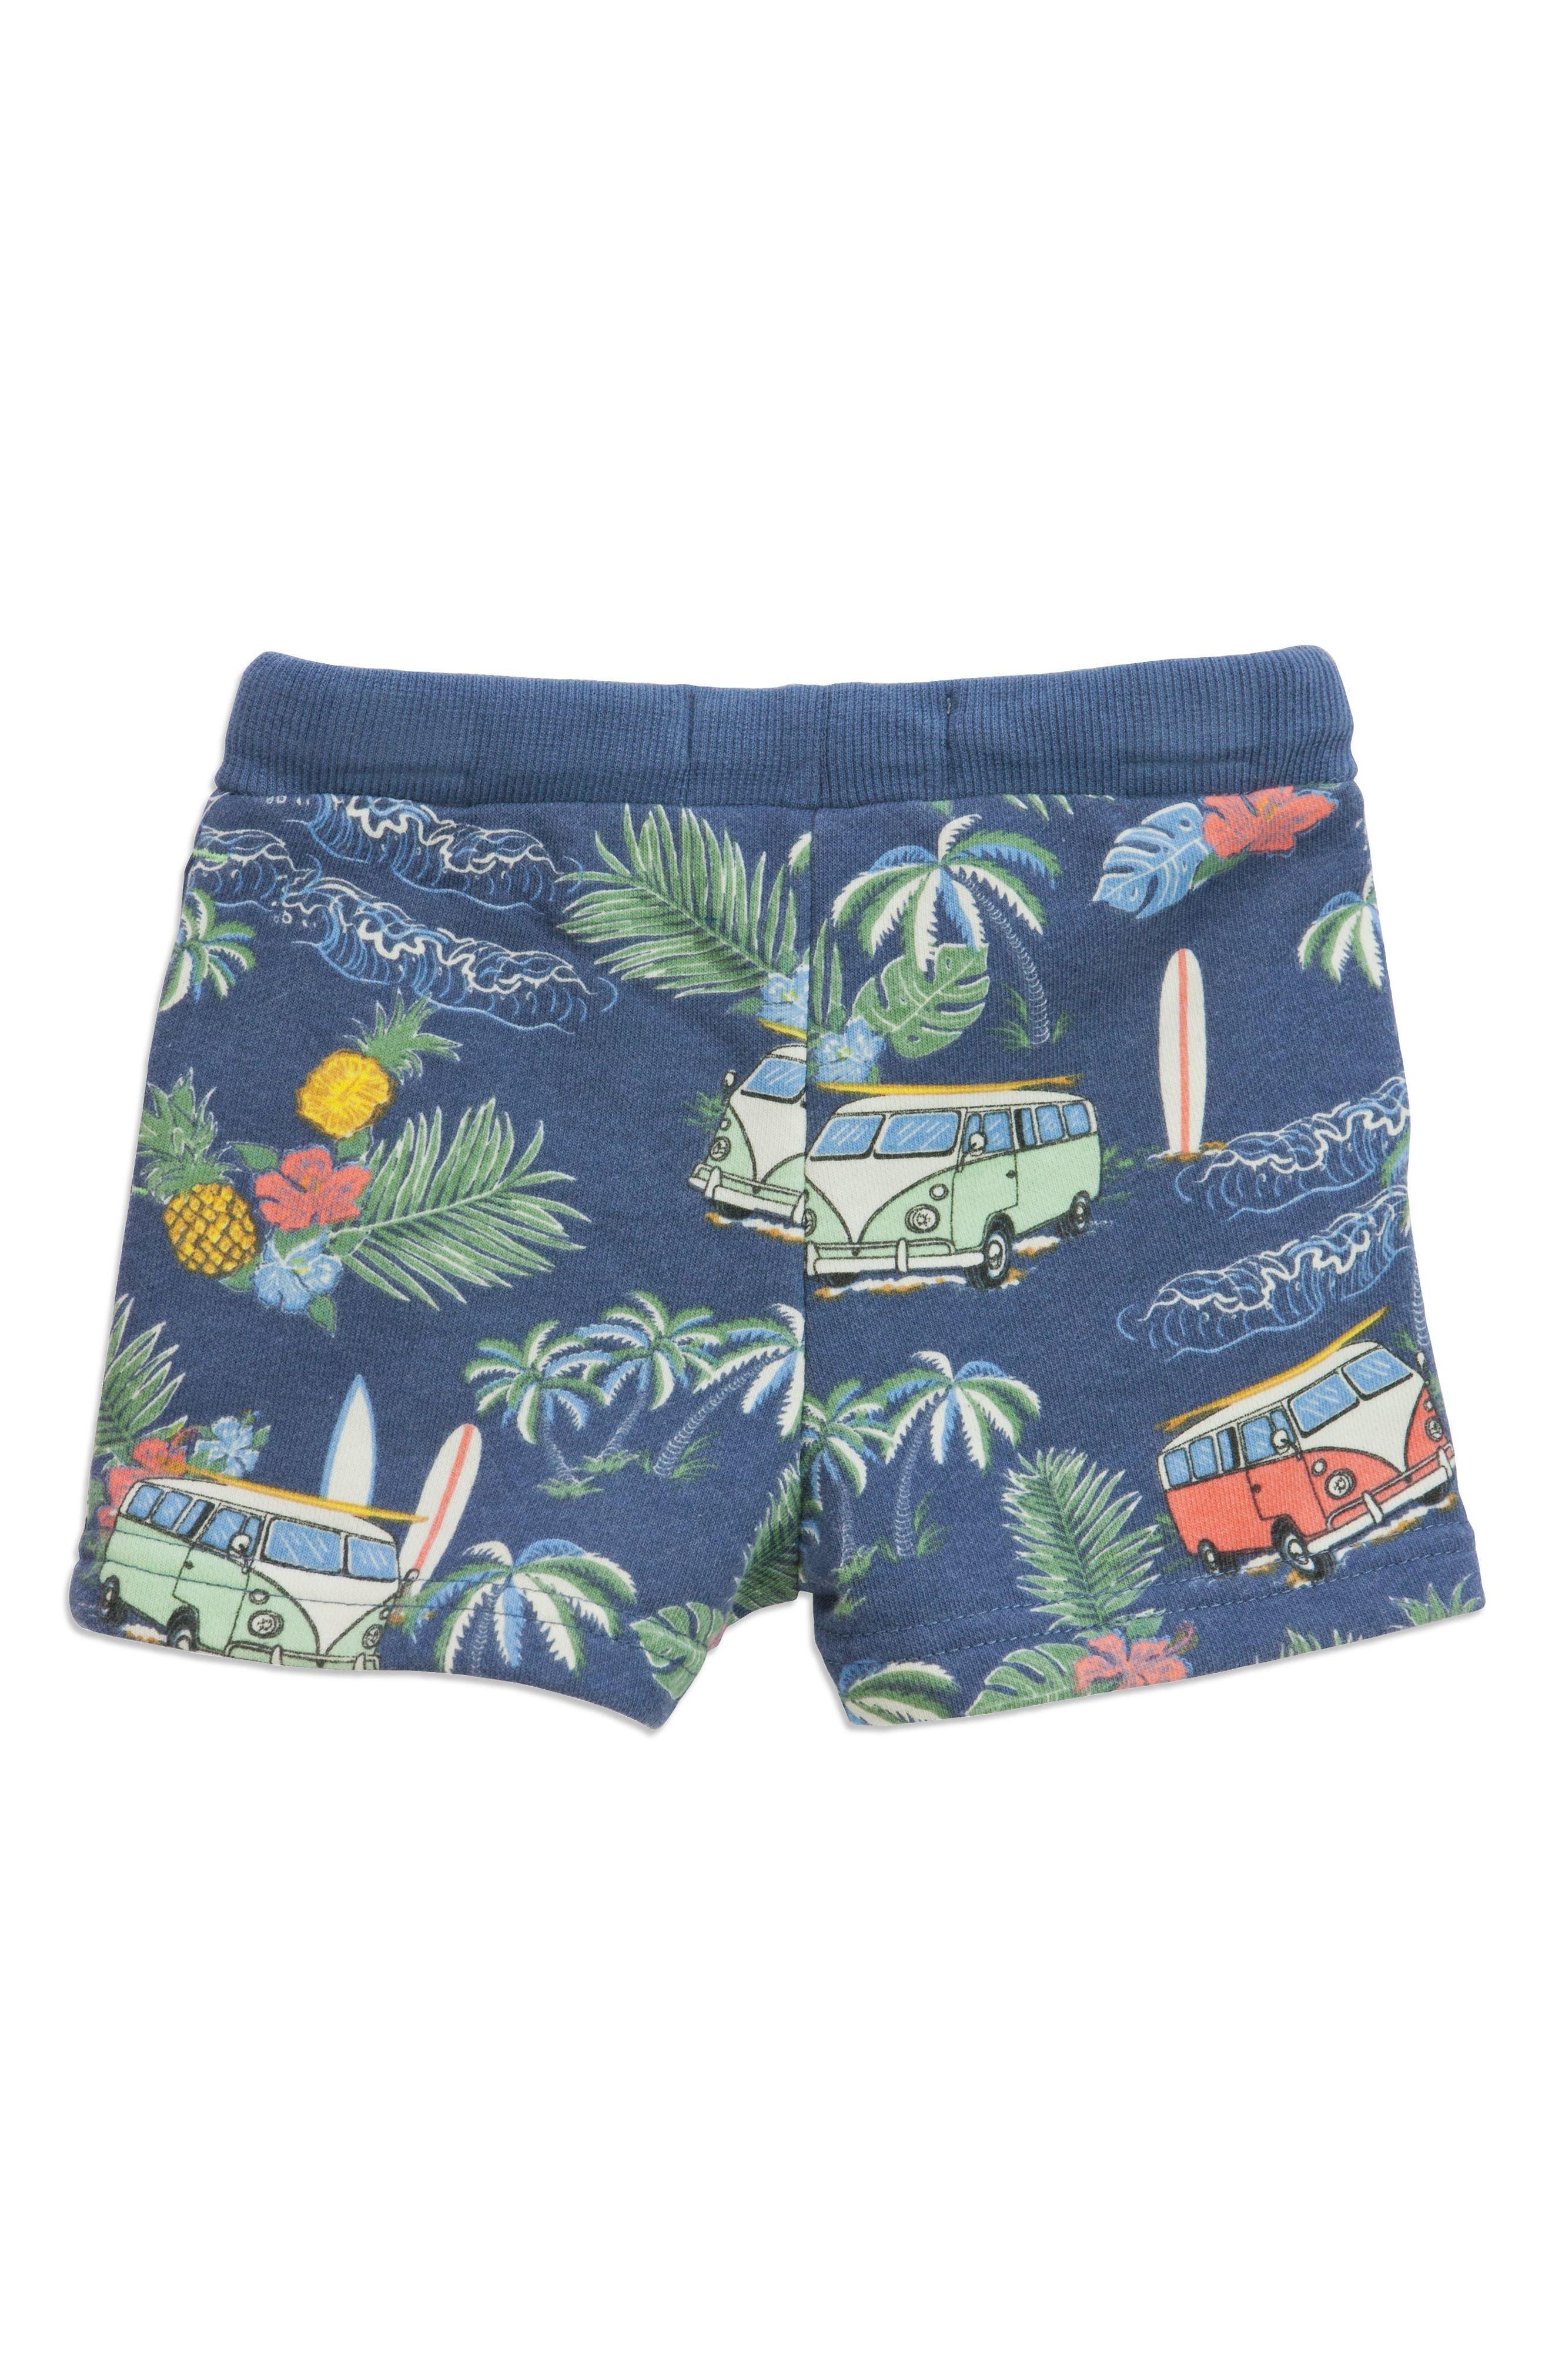 Summer Vacay Adriel Knit Shorts,                             Alternate thumbnail 2, color,                             Blue